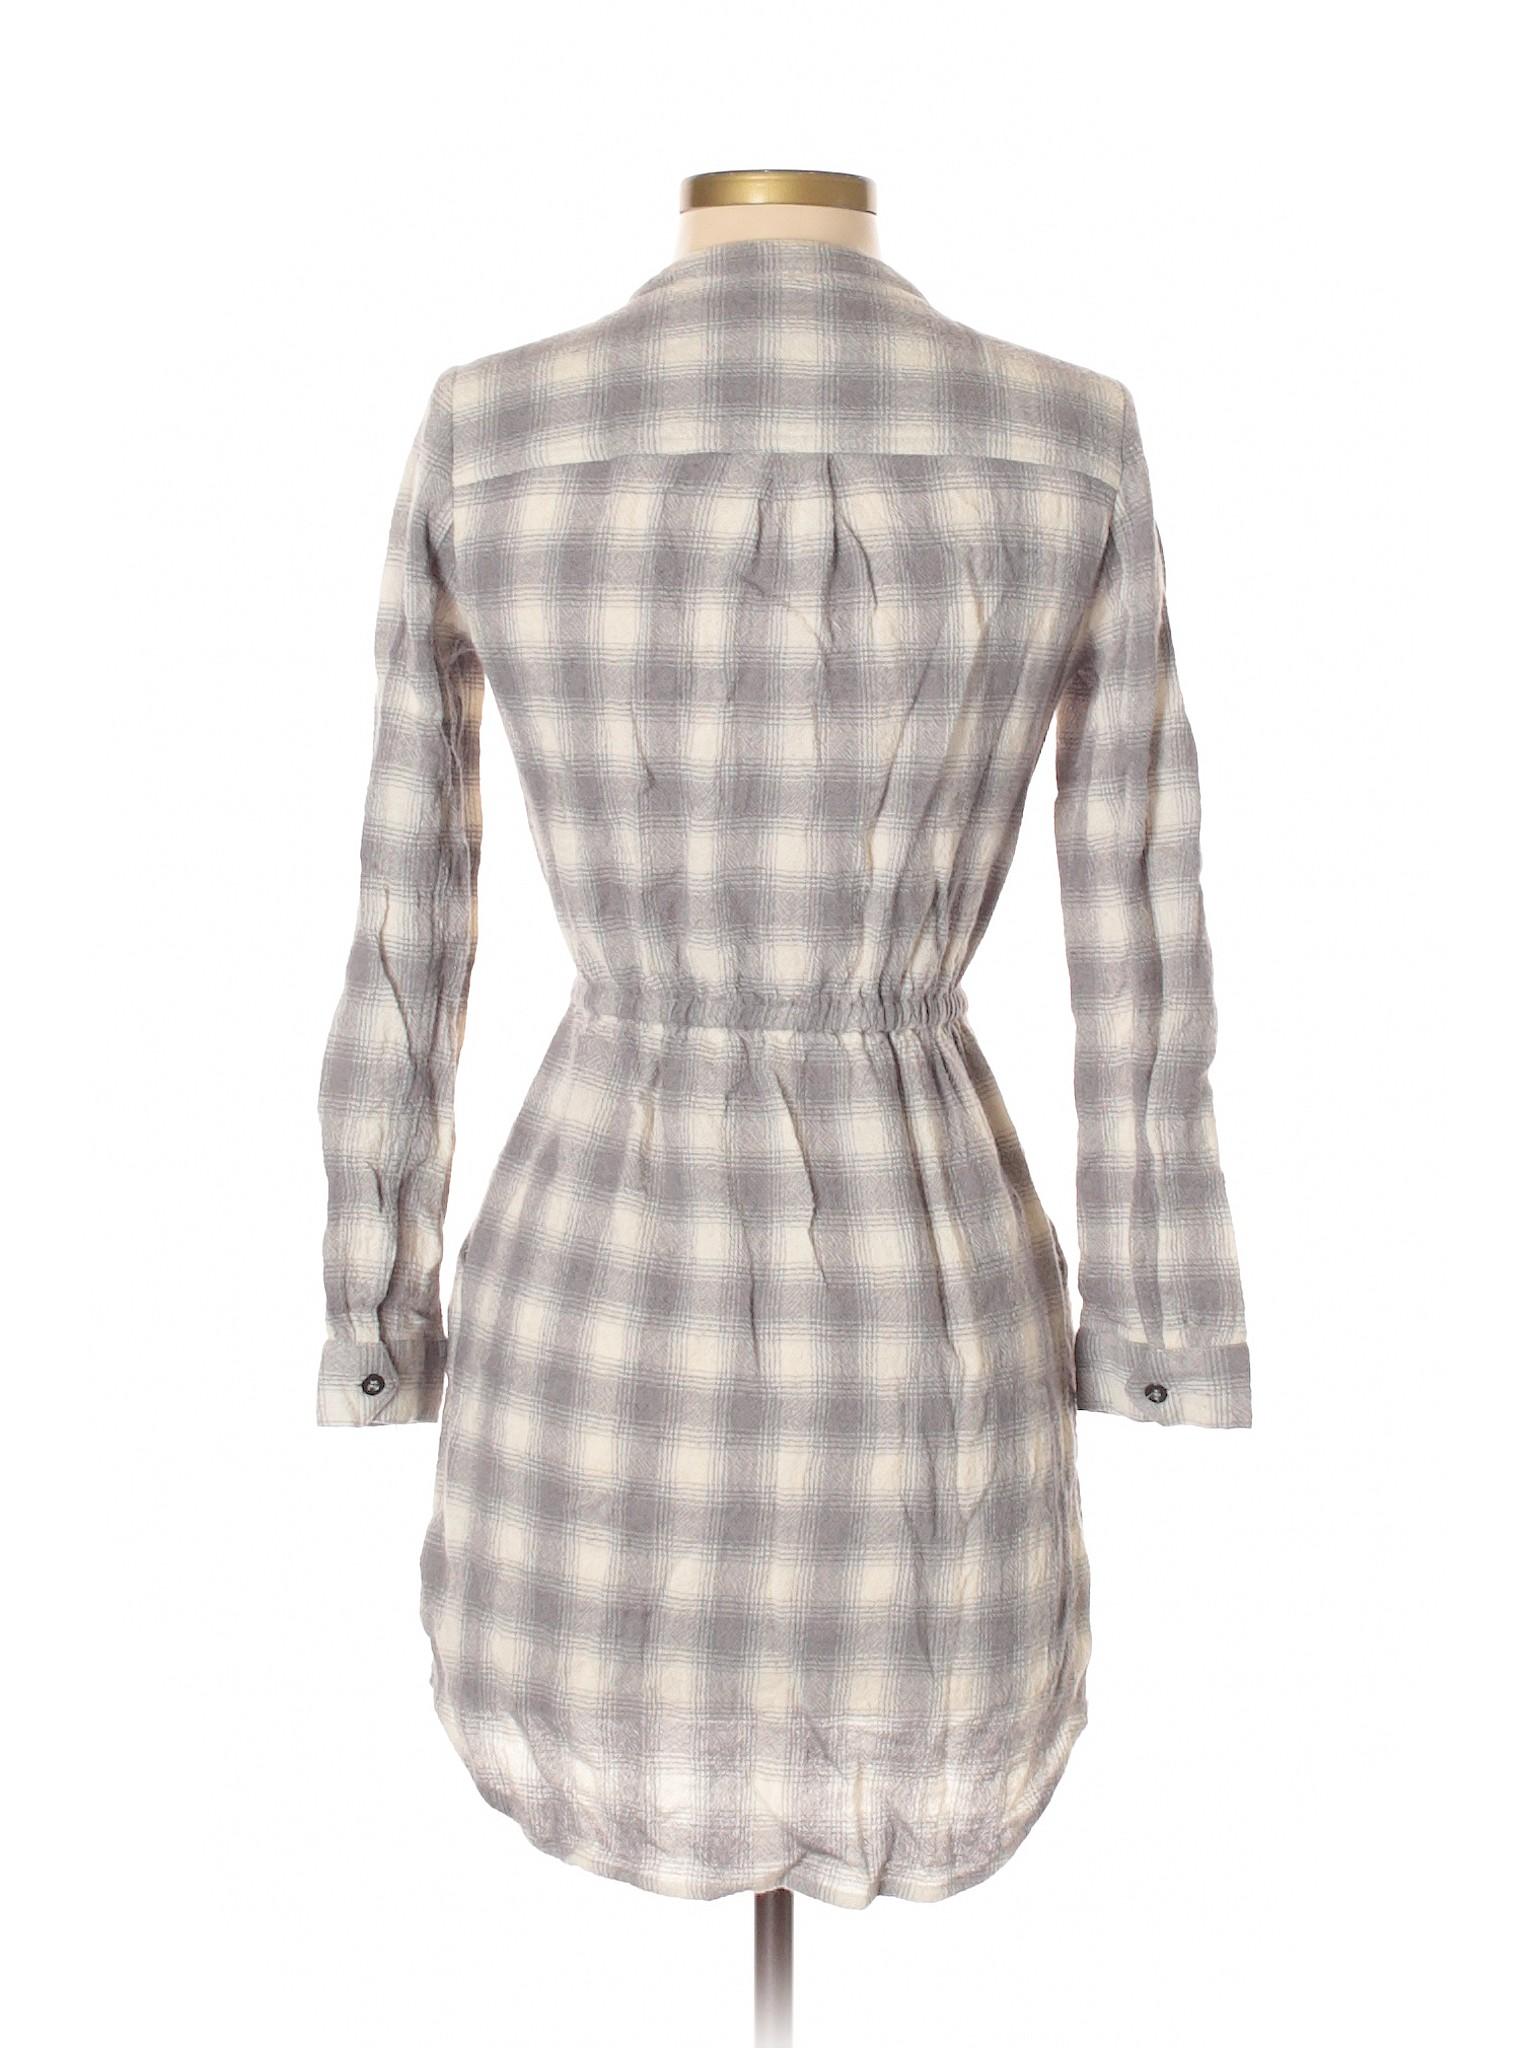 Selling Casual amp; Dress Broadway Broome gqrgX